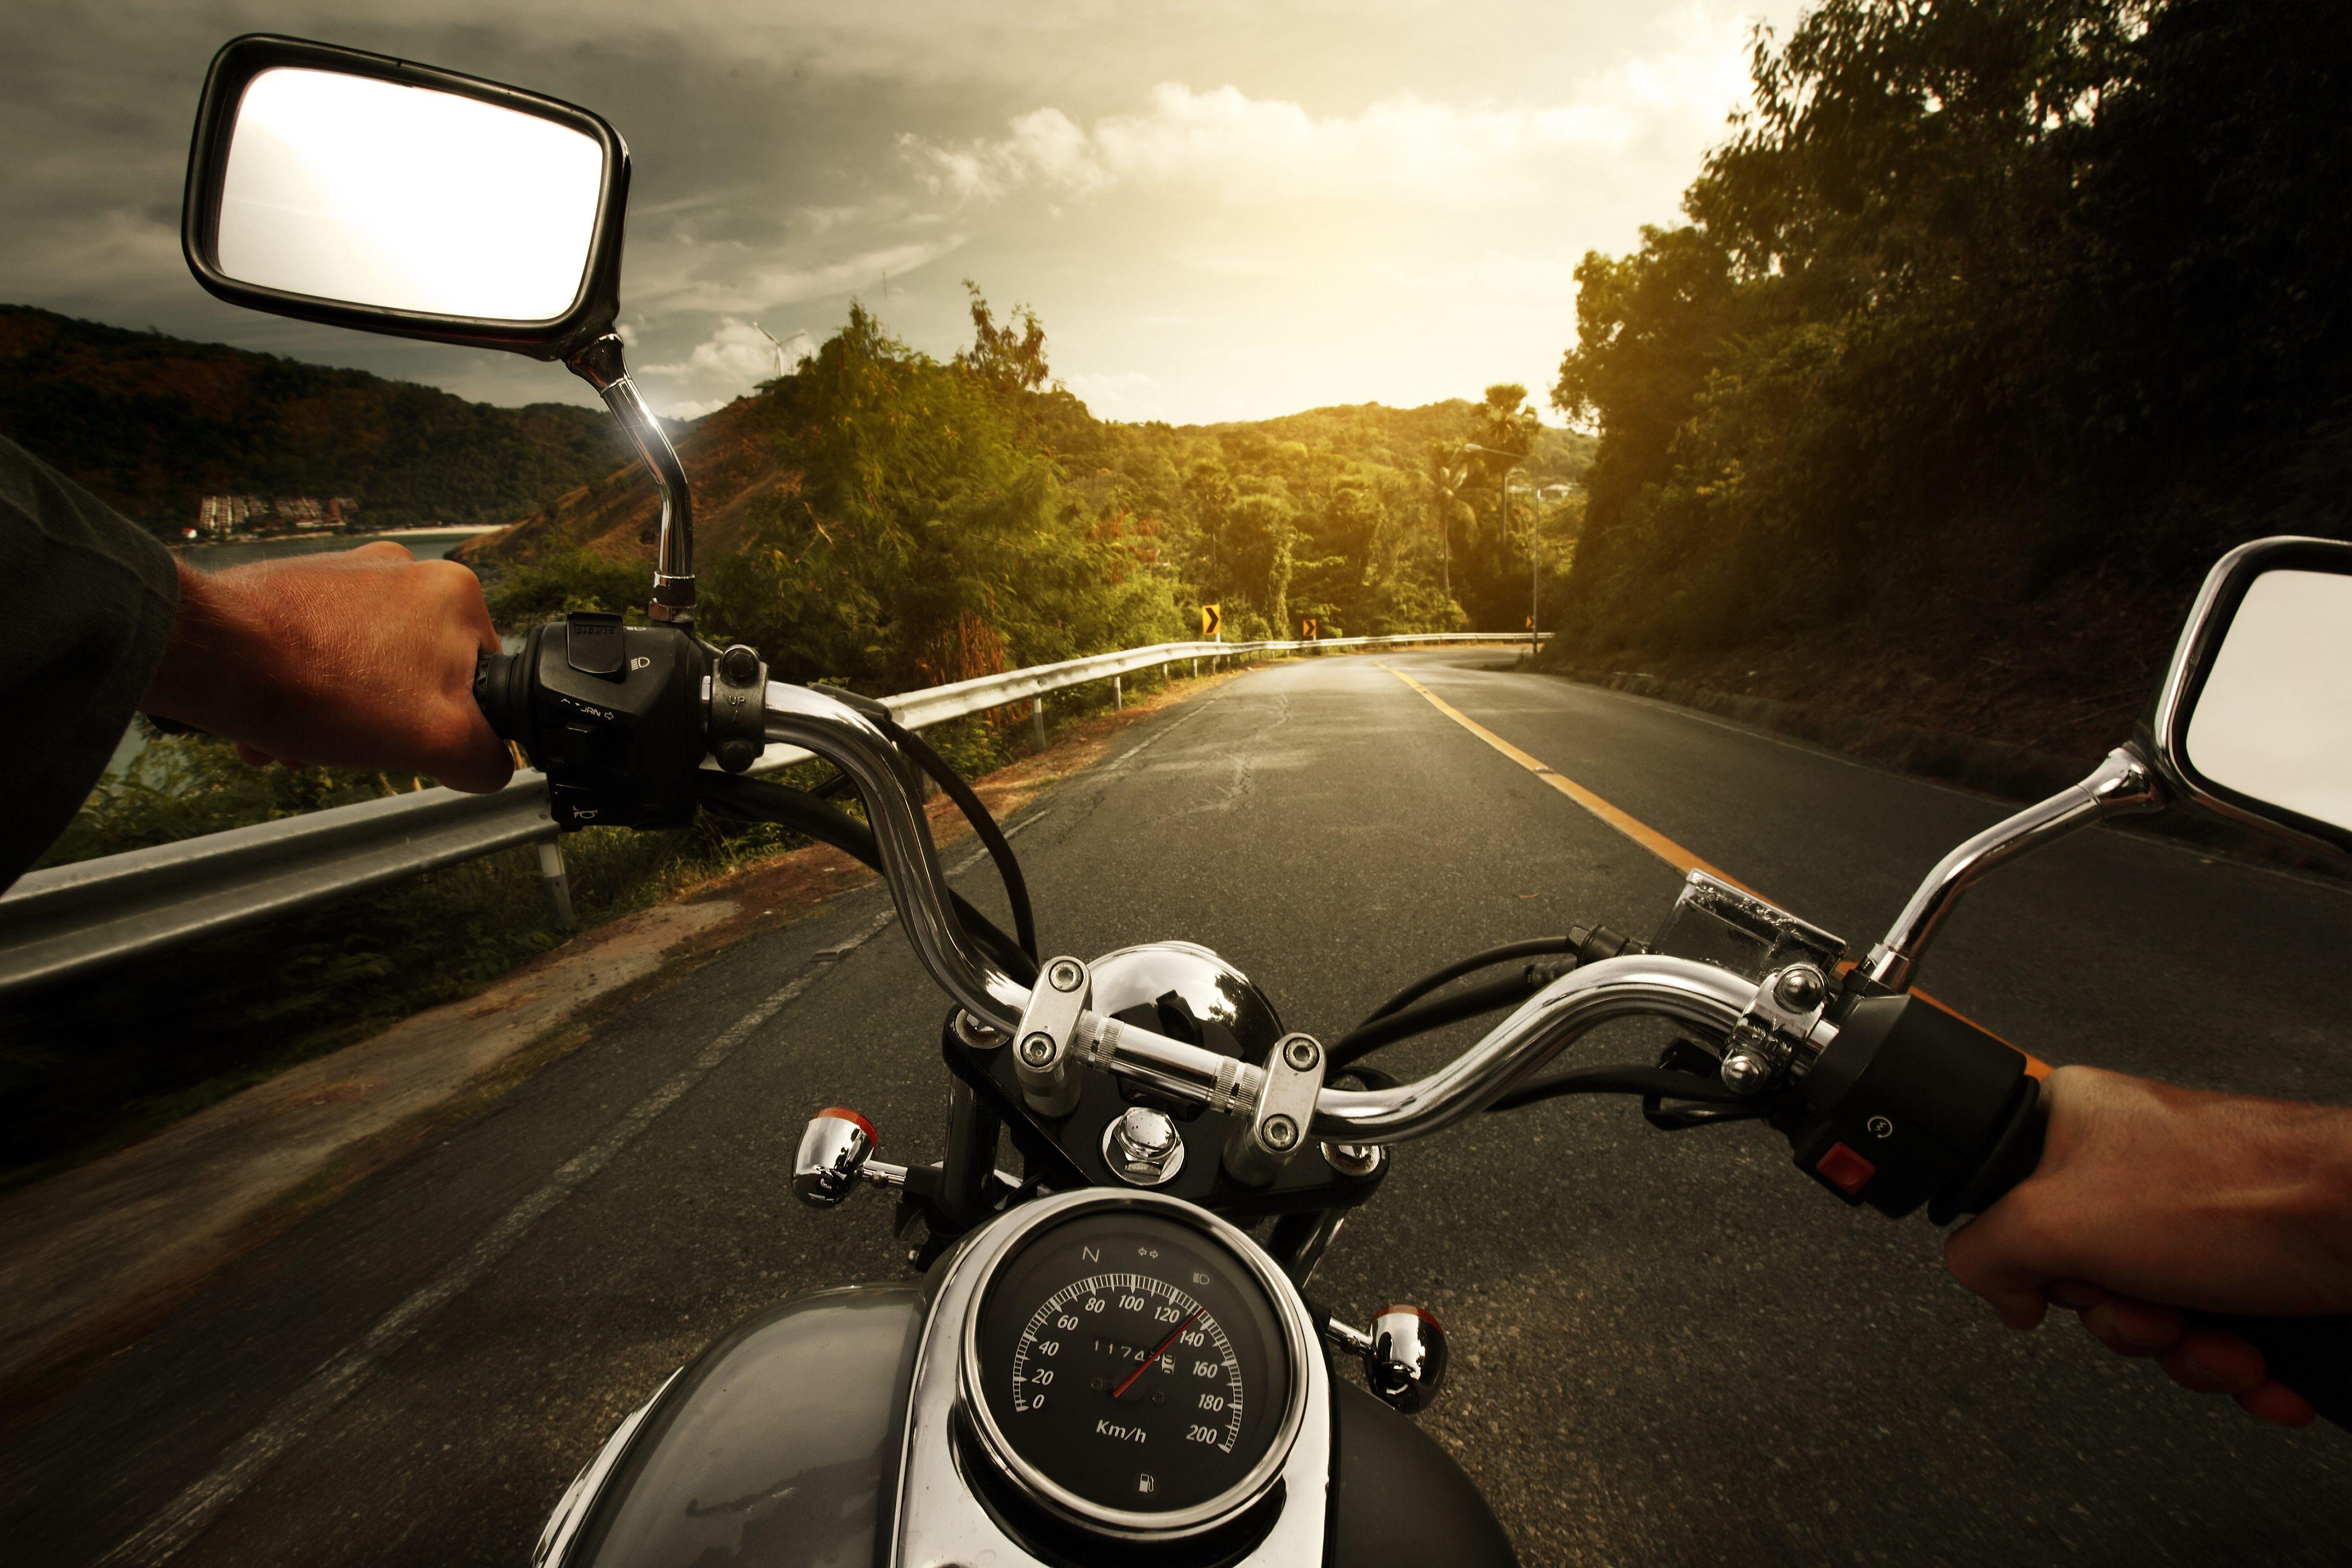 American Bikers Ride For Fun